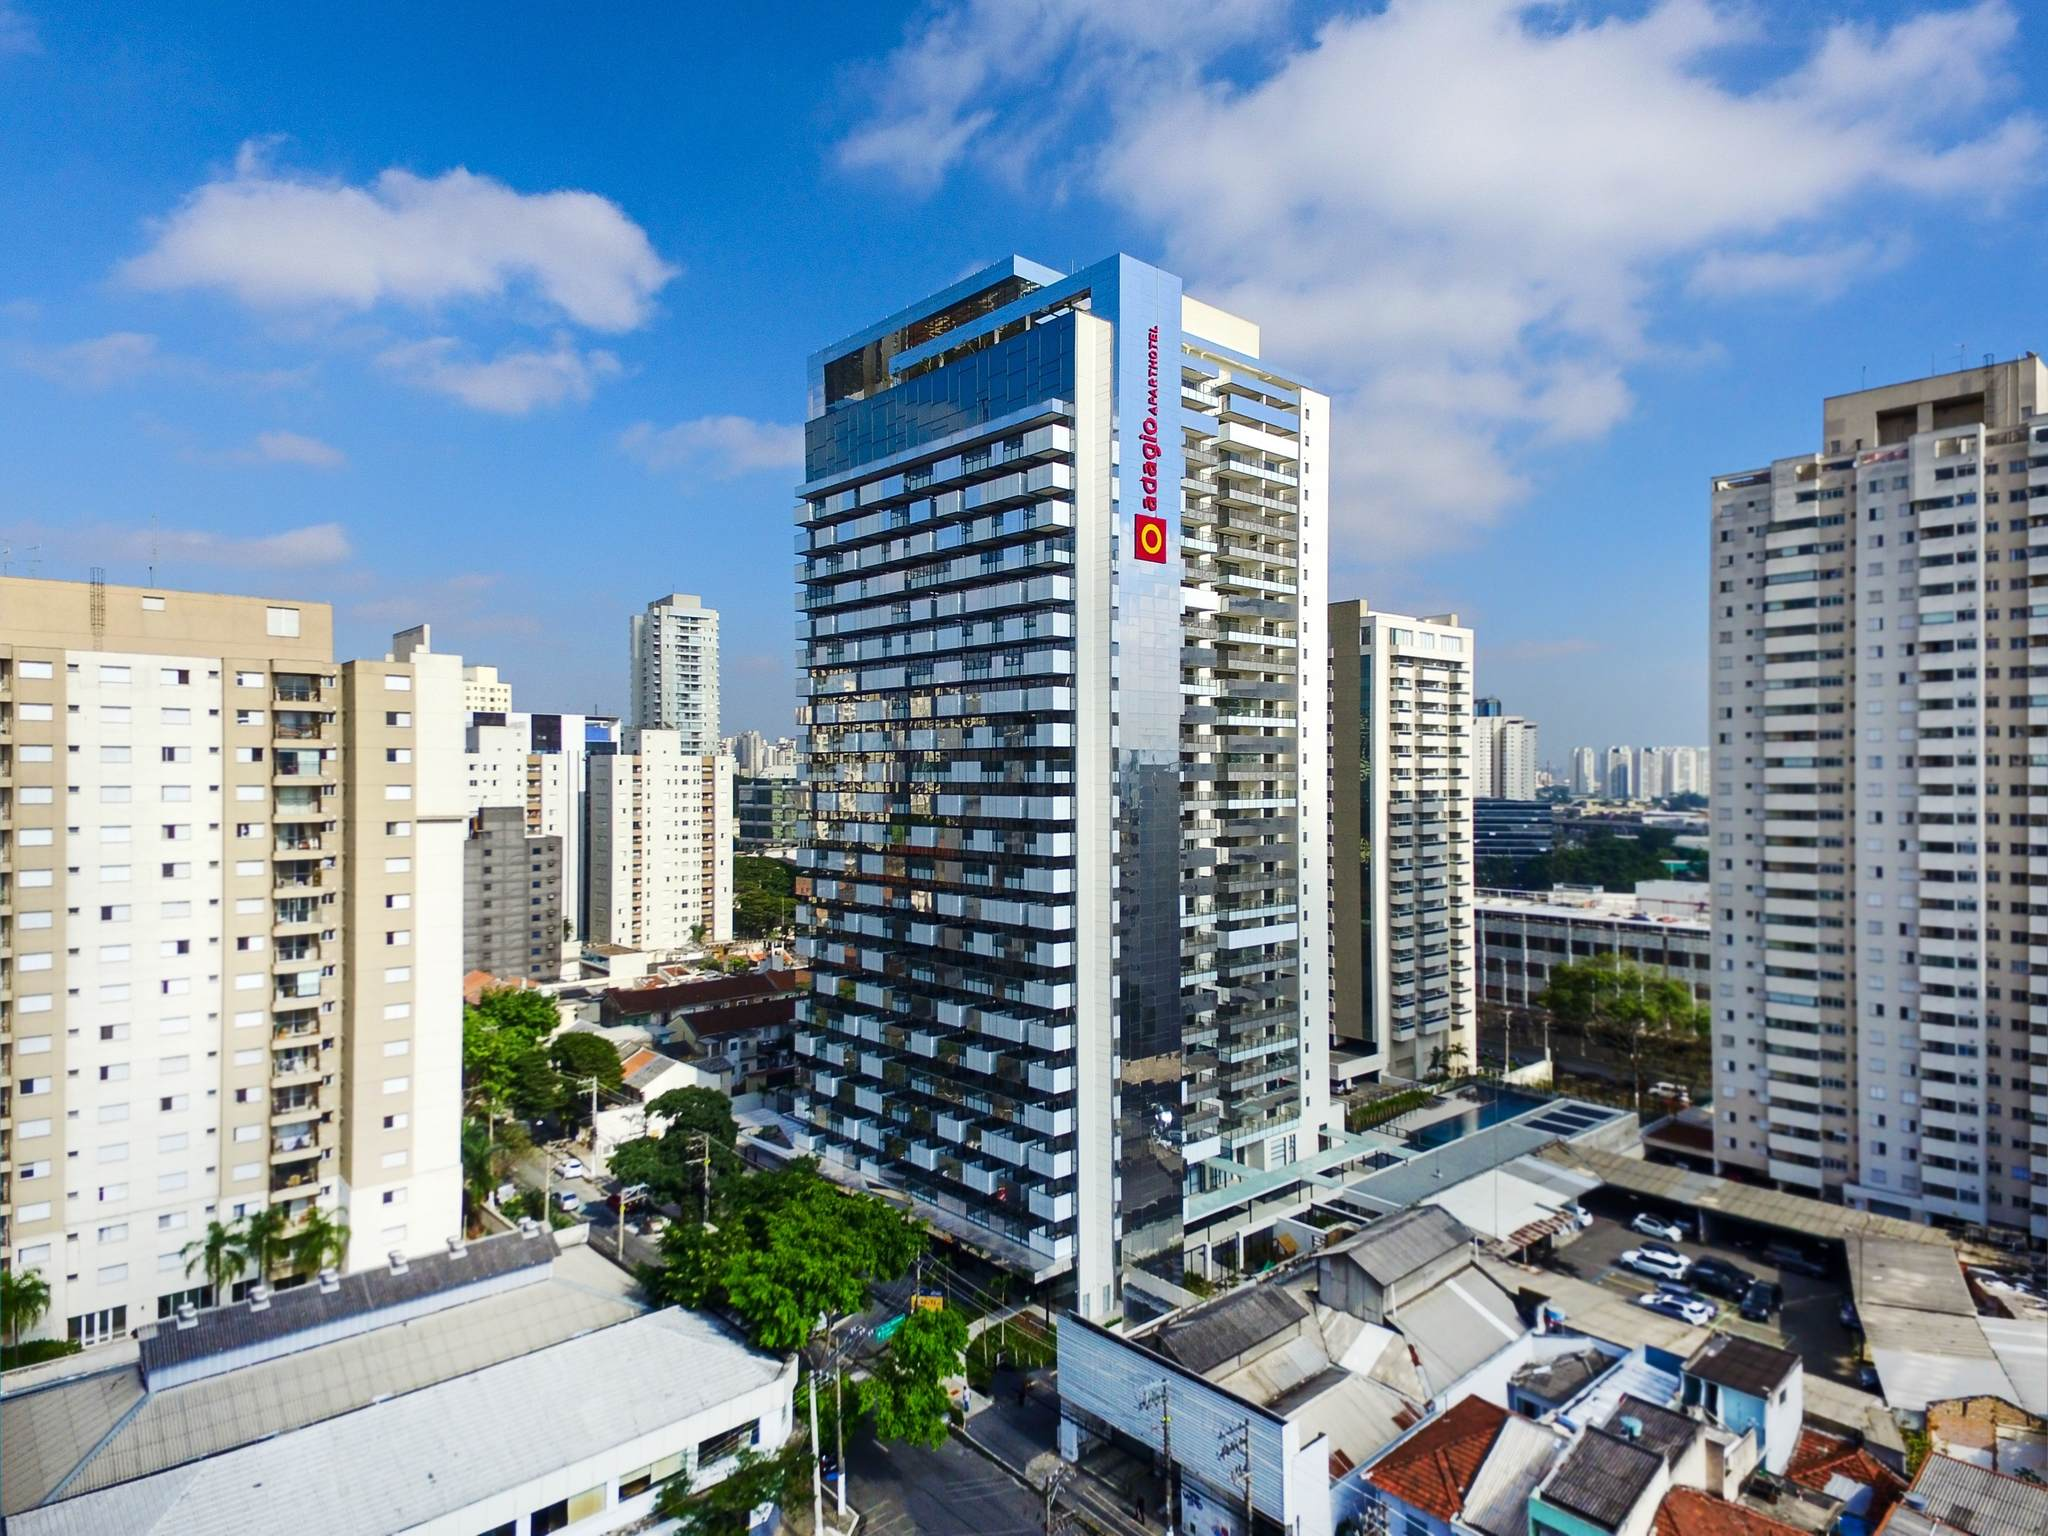 Hotel – Hotel de apartamentos Adagio São Paulo Barra Funda